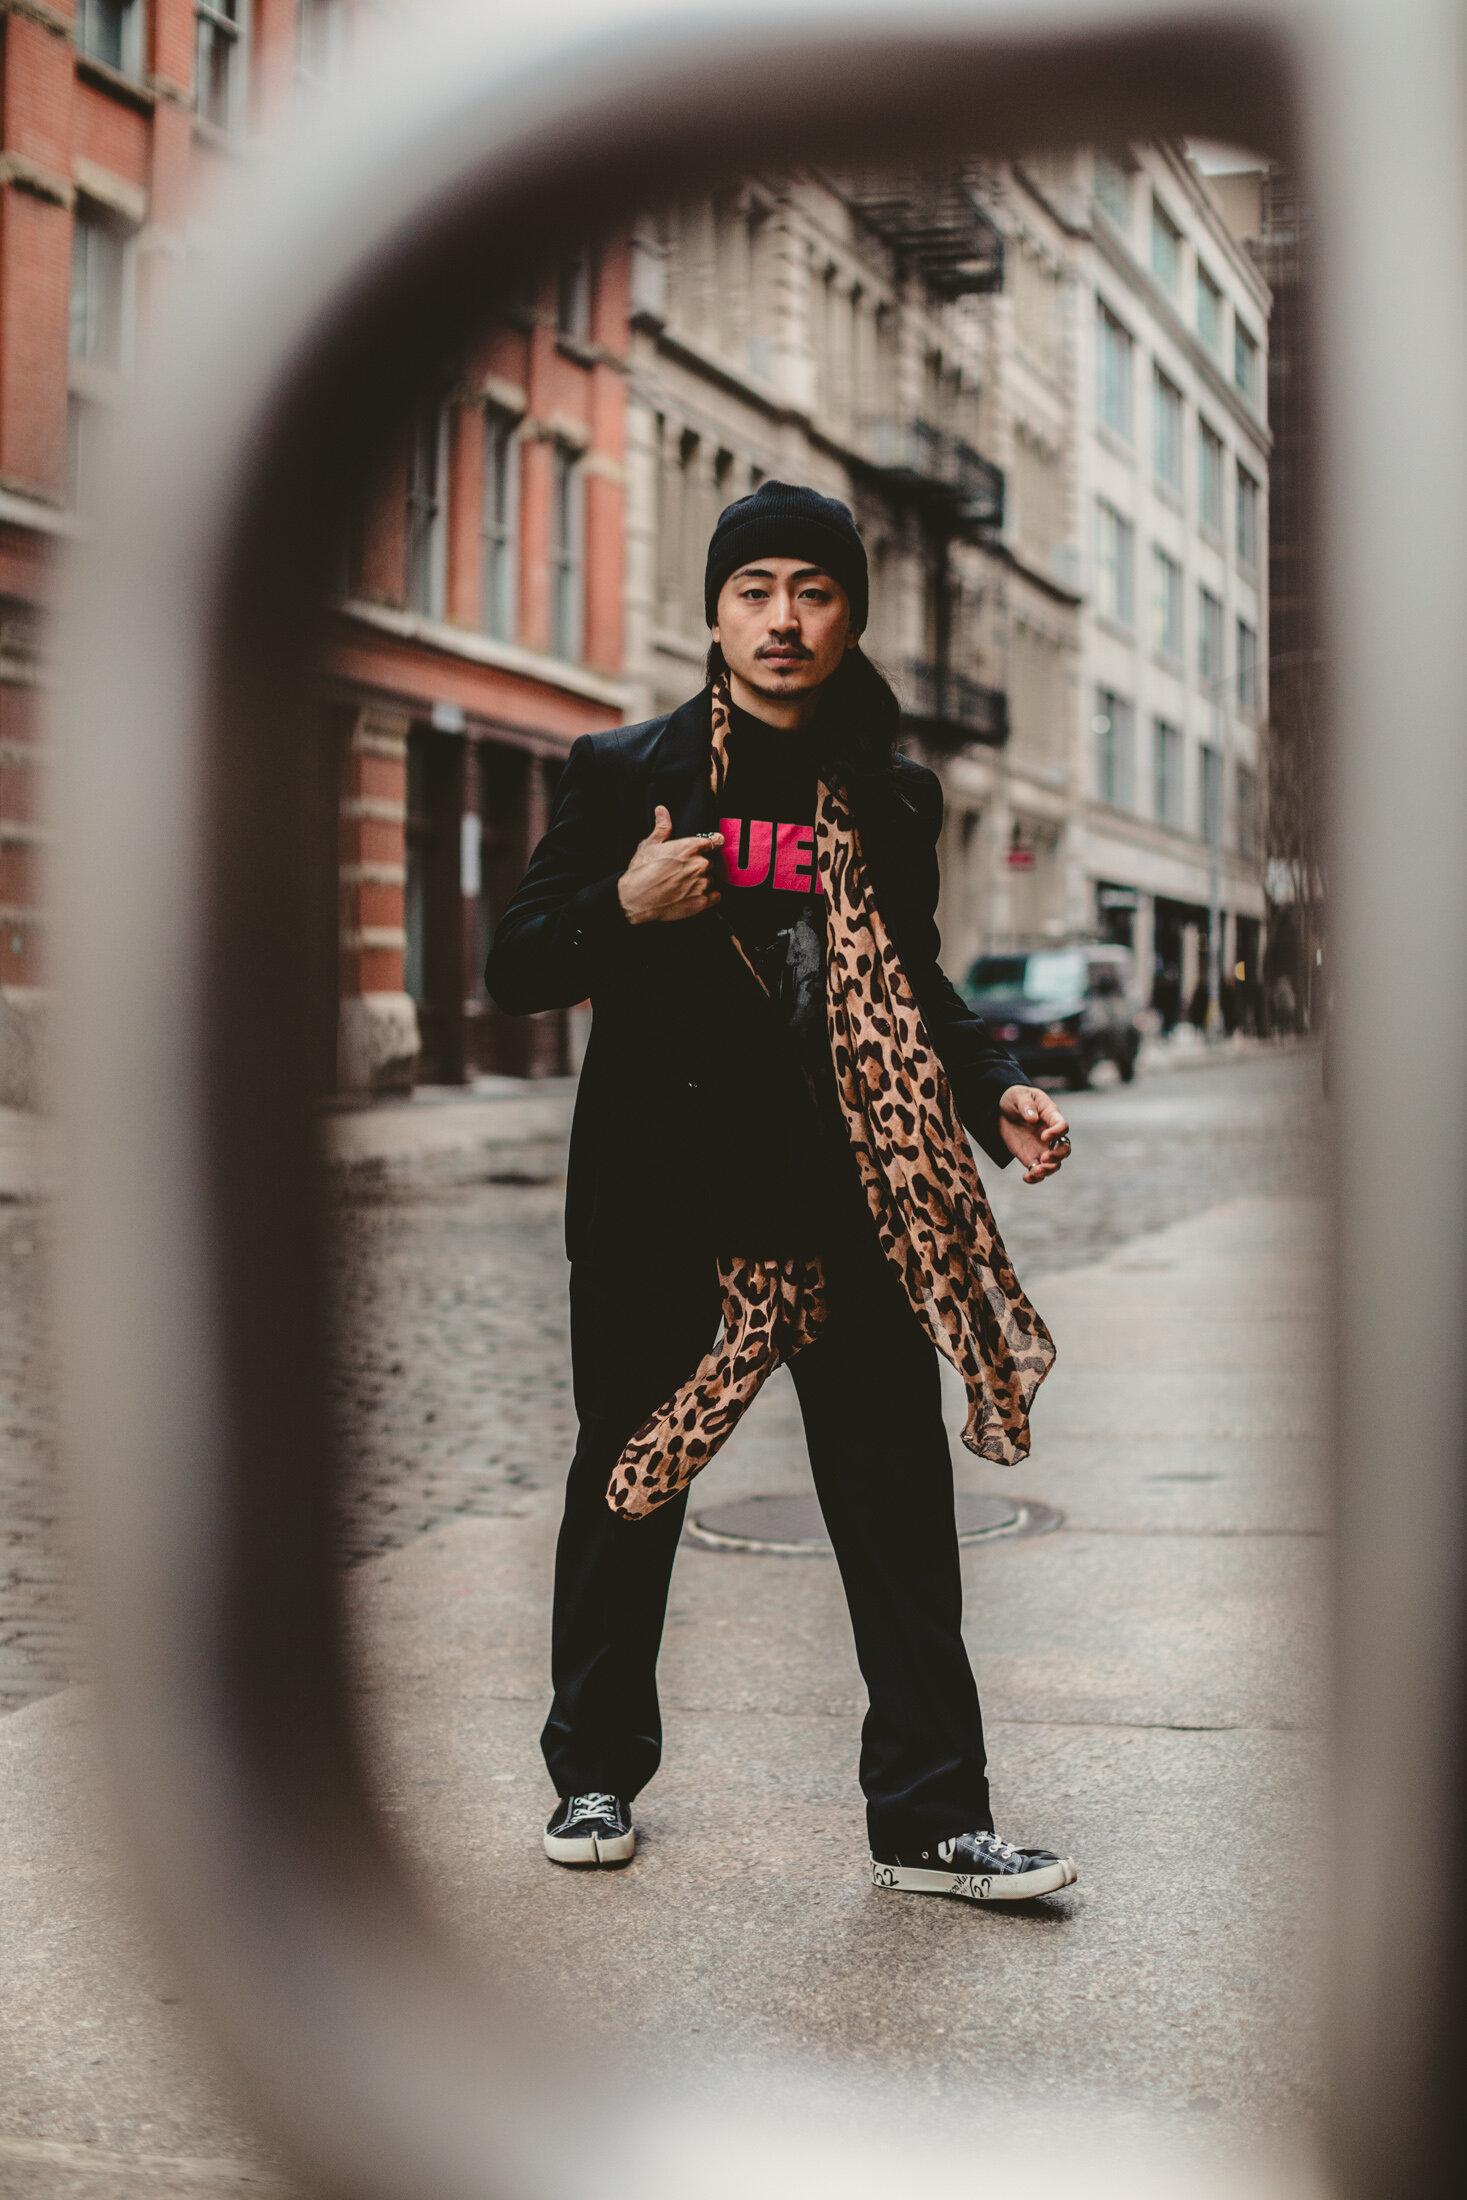 2020-01-27 BLOG Nico - Fashion - New York City, New York - Jack Robert Photography-14.jpg